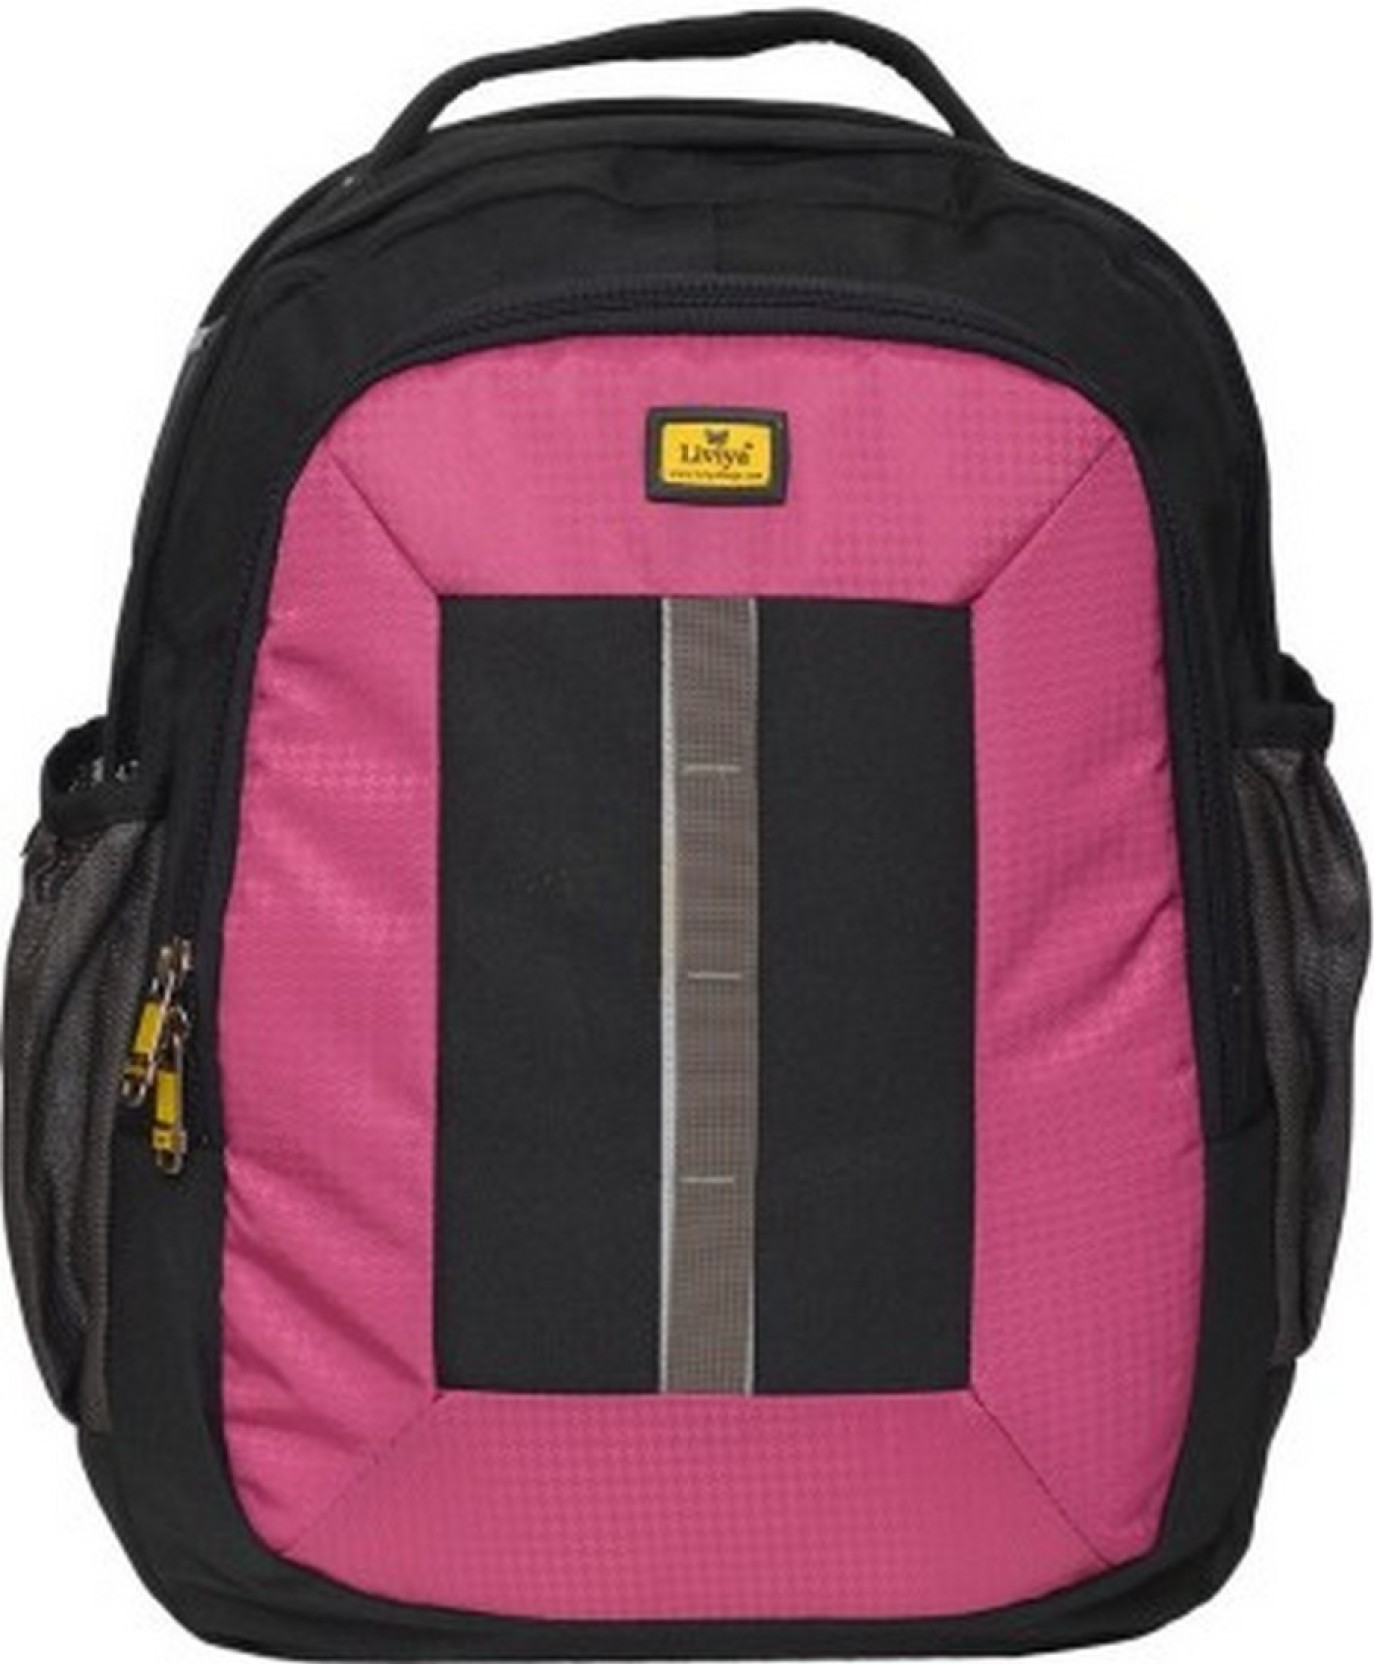 dc1db53aff79 Liviya SB-1002 22 L Backpack (Black